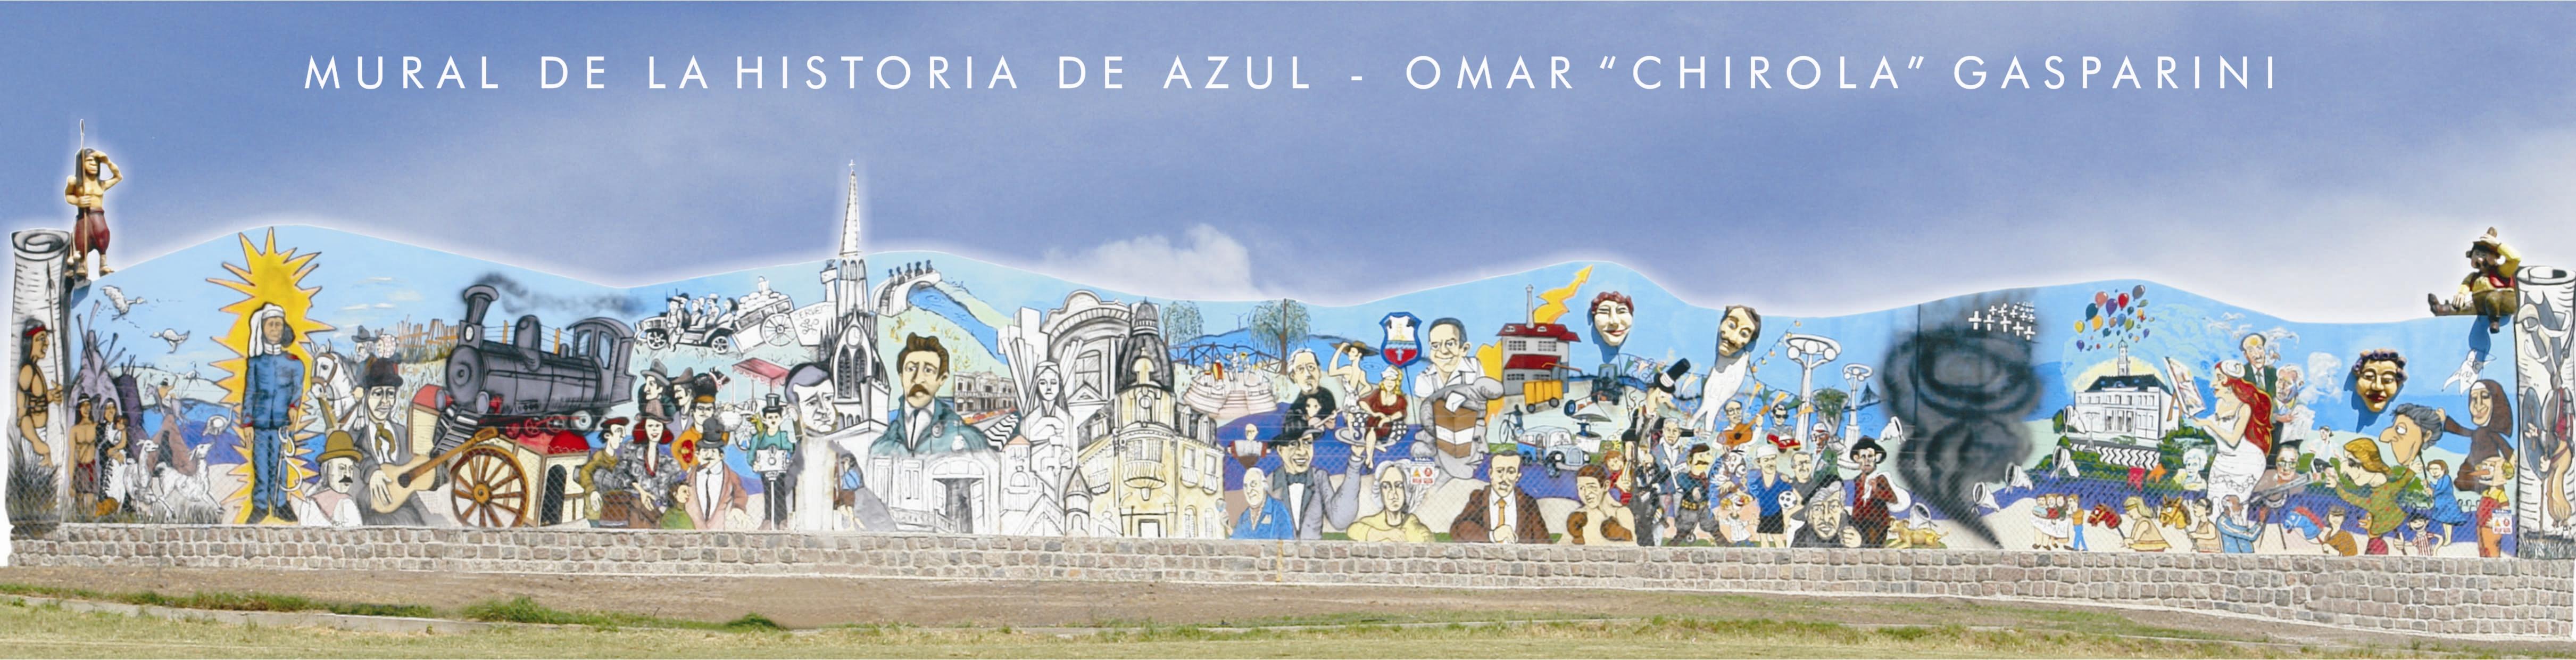 Azul ciudad cervantina de la argentina patrimonio para for El mural pelicula argentina